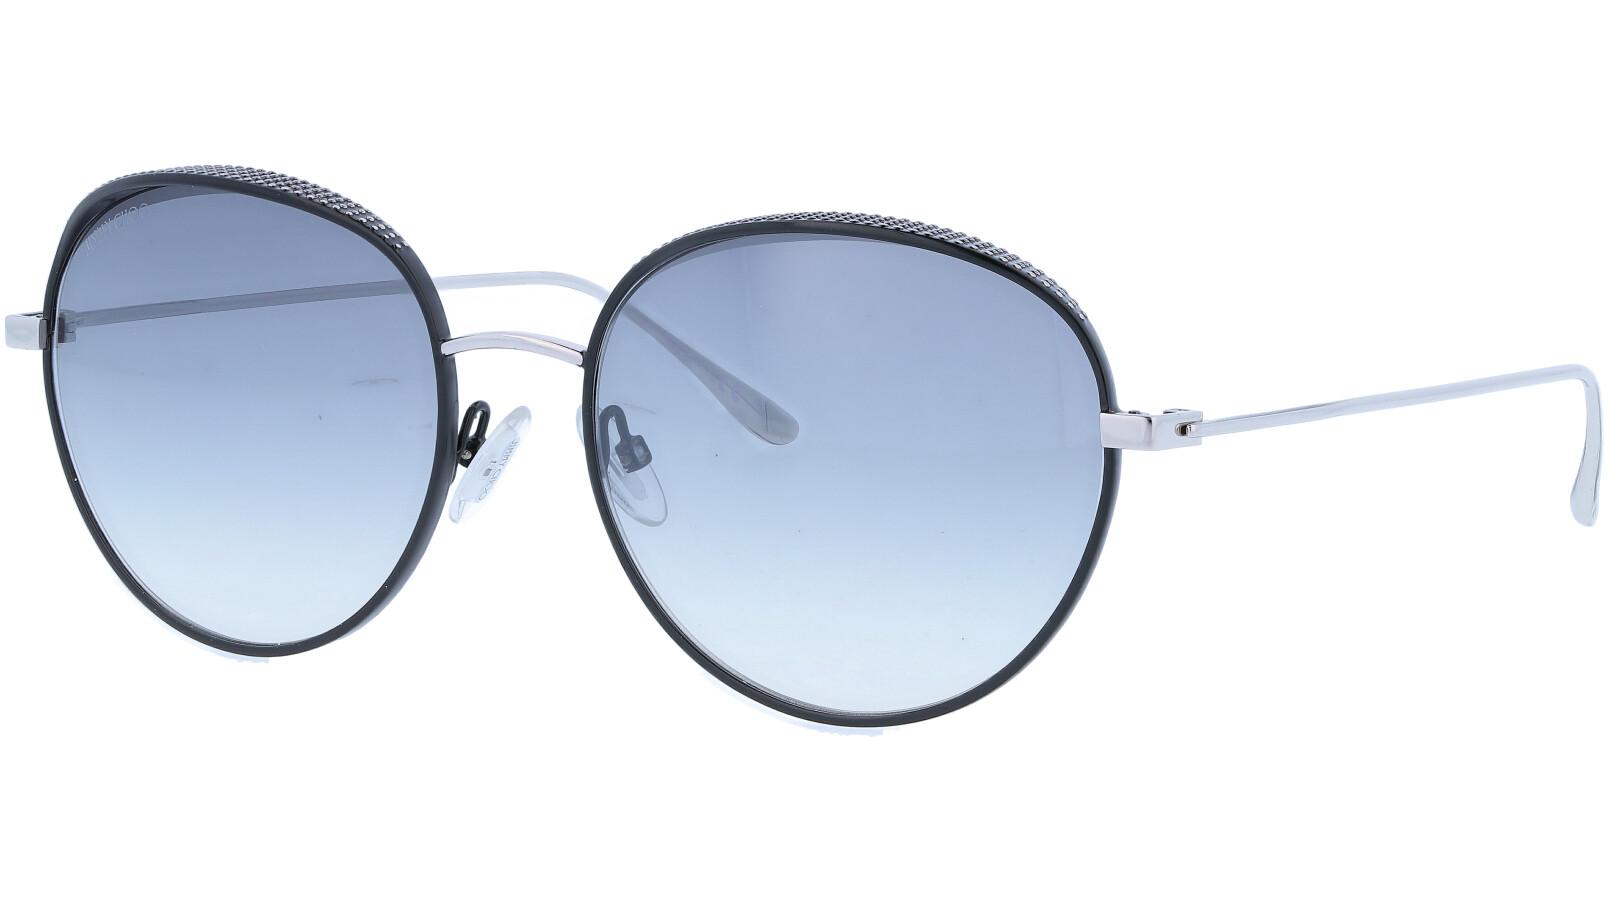 JIMMY CHOO ELLOS JINIC 56 BLACK Sunglasses